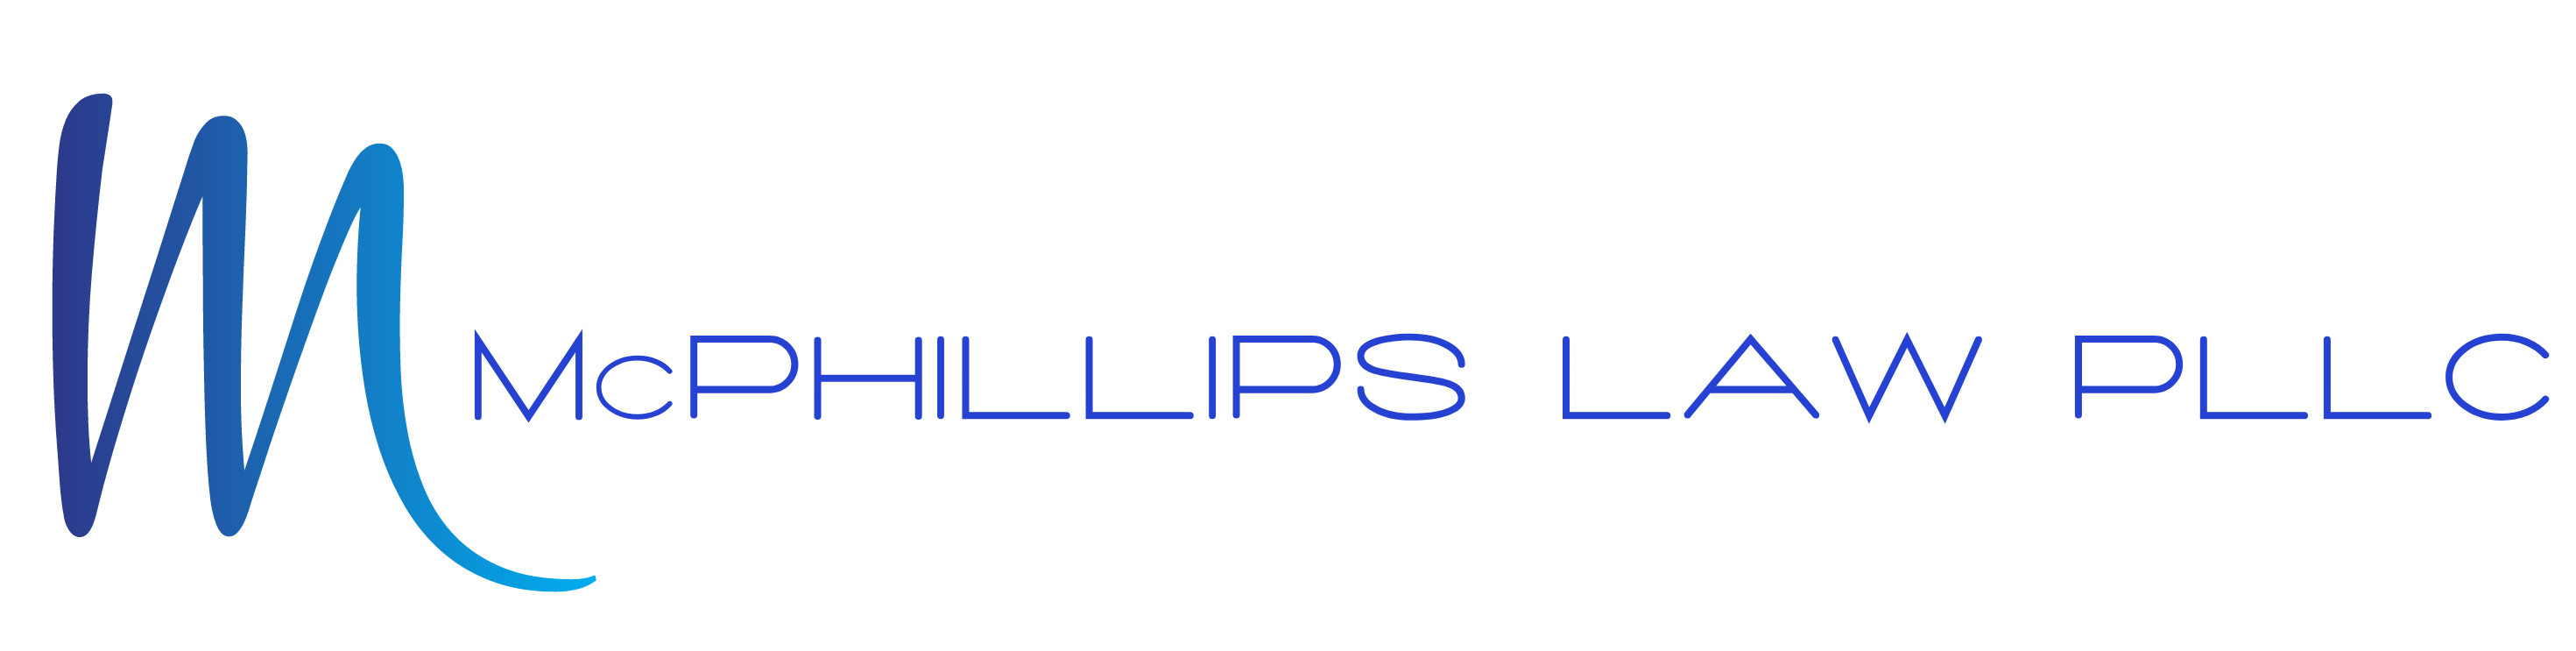 McPhillips Law PLLC